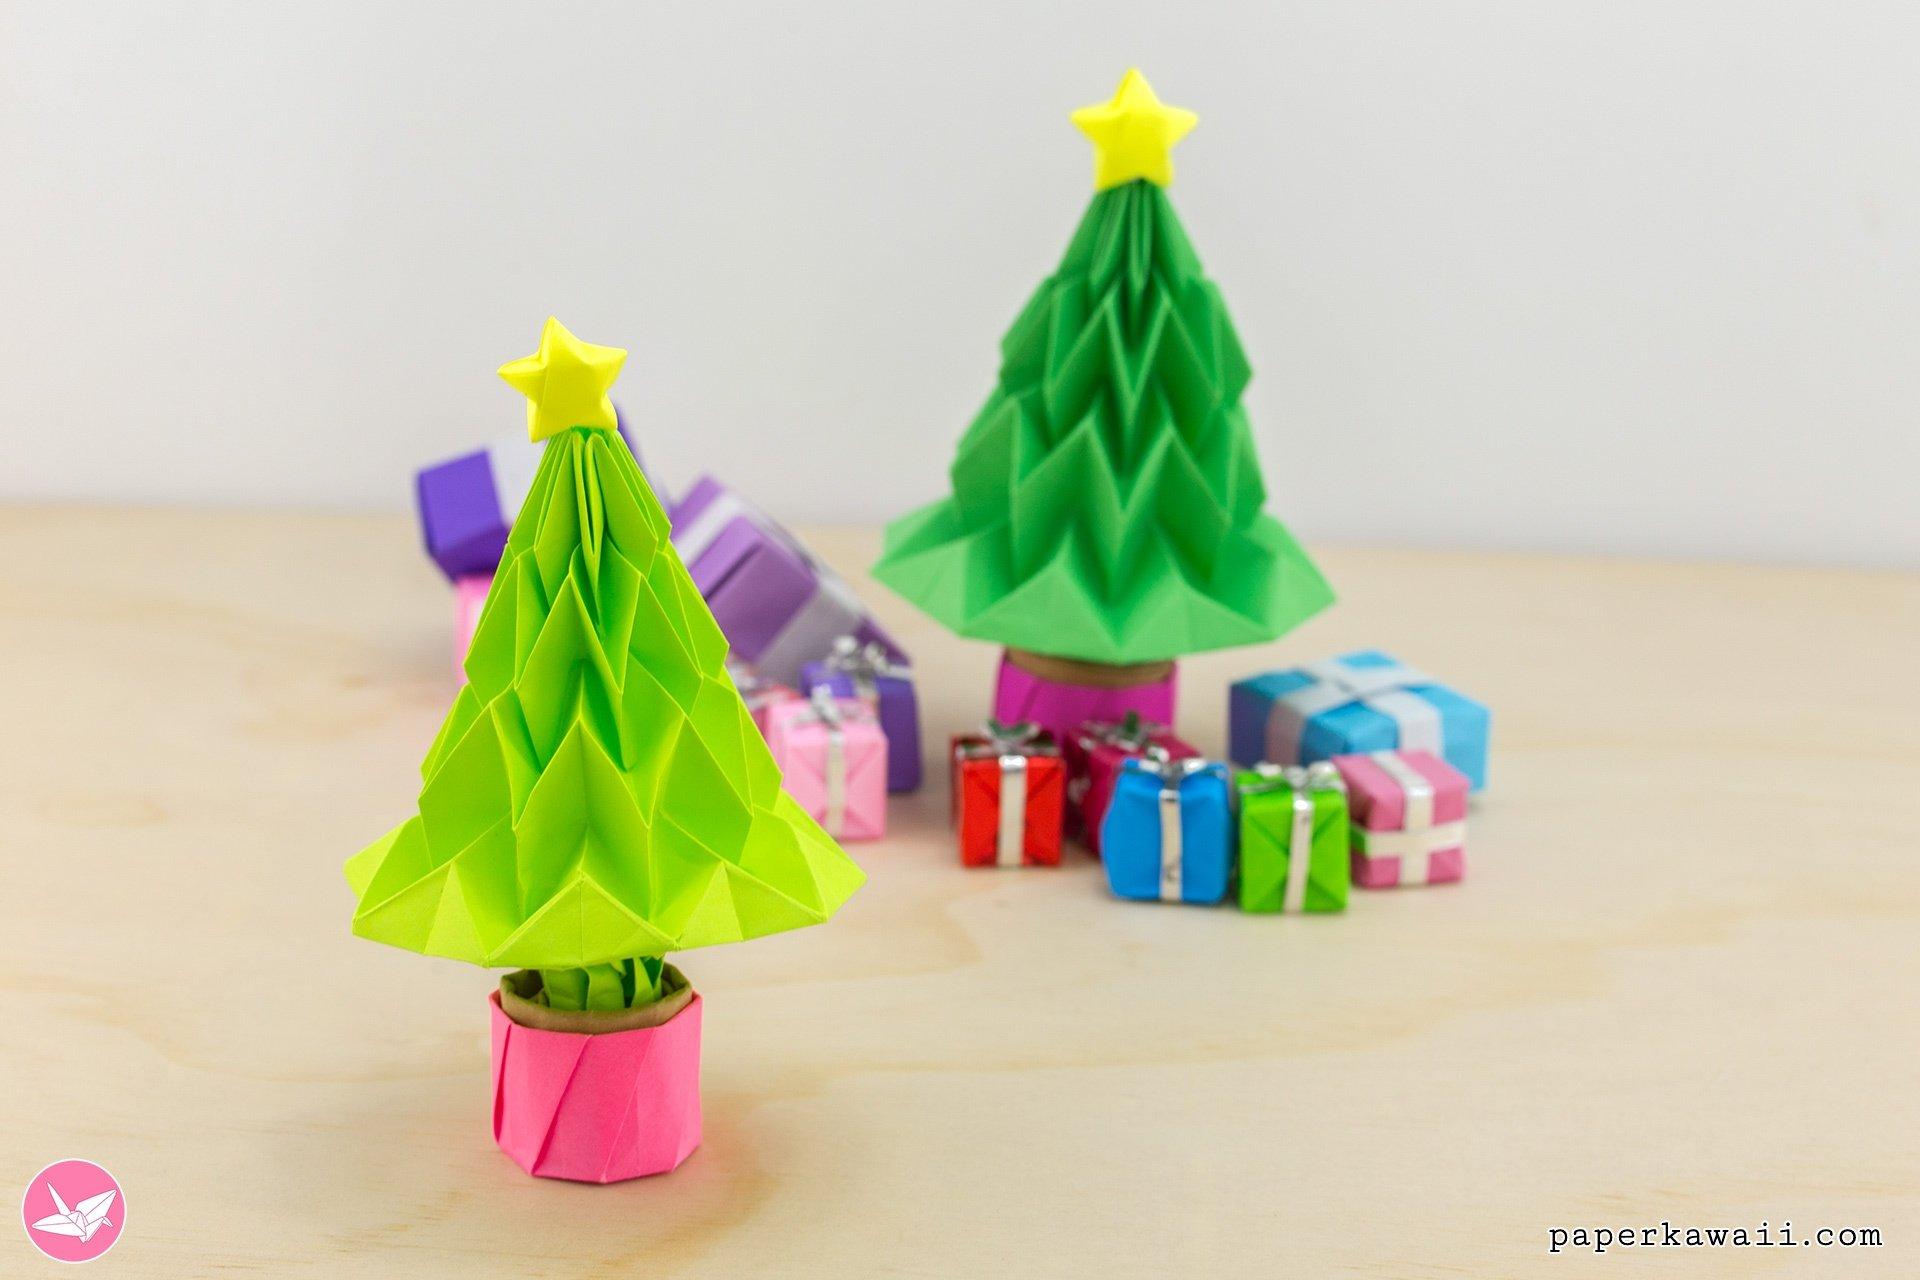 Origami Christmas Tree Tutorial - Accordion Folding via @paper_kawaii